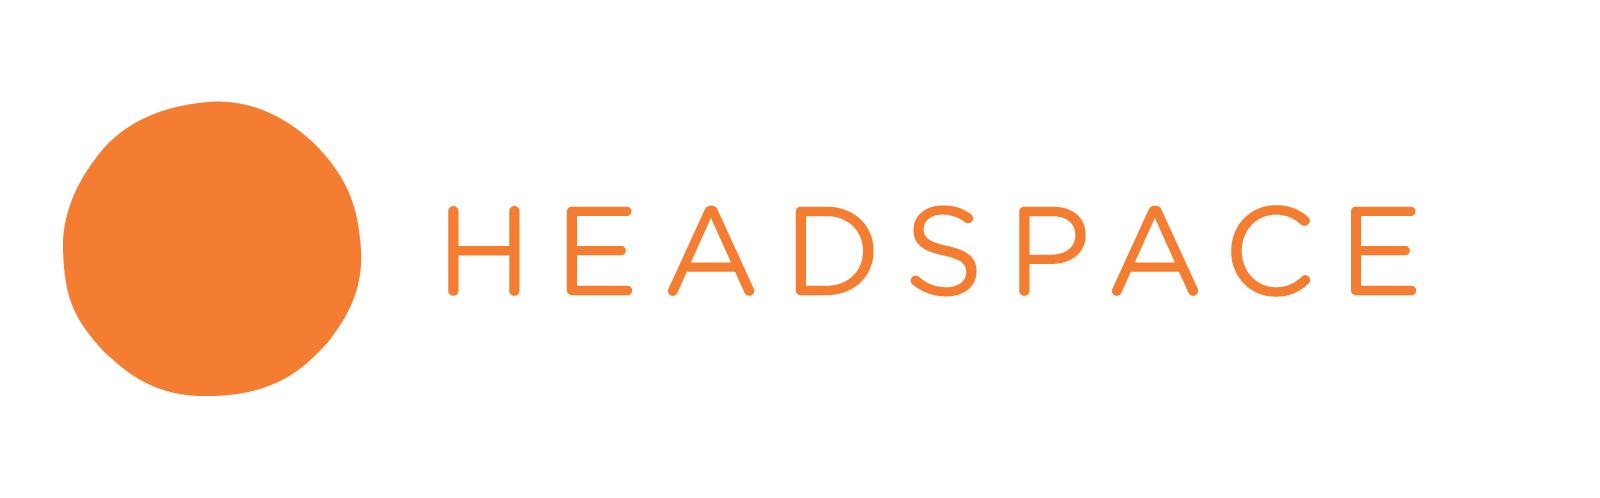 headspace1.jpg